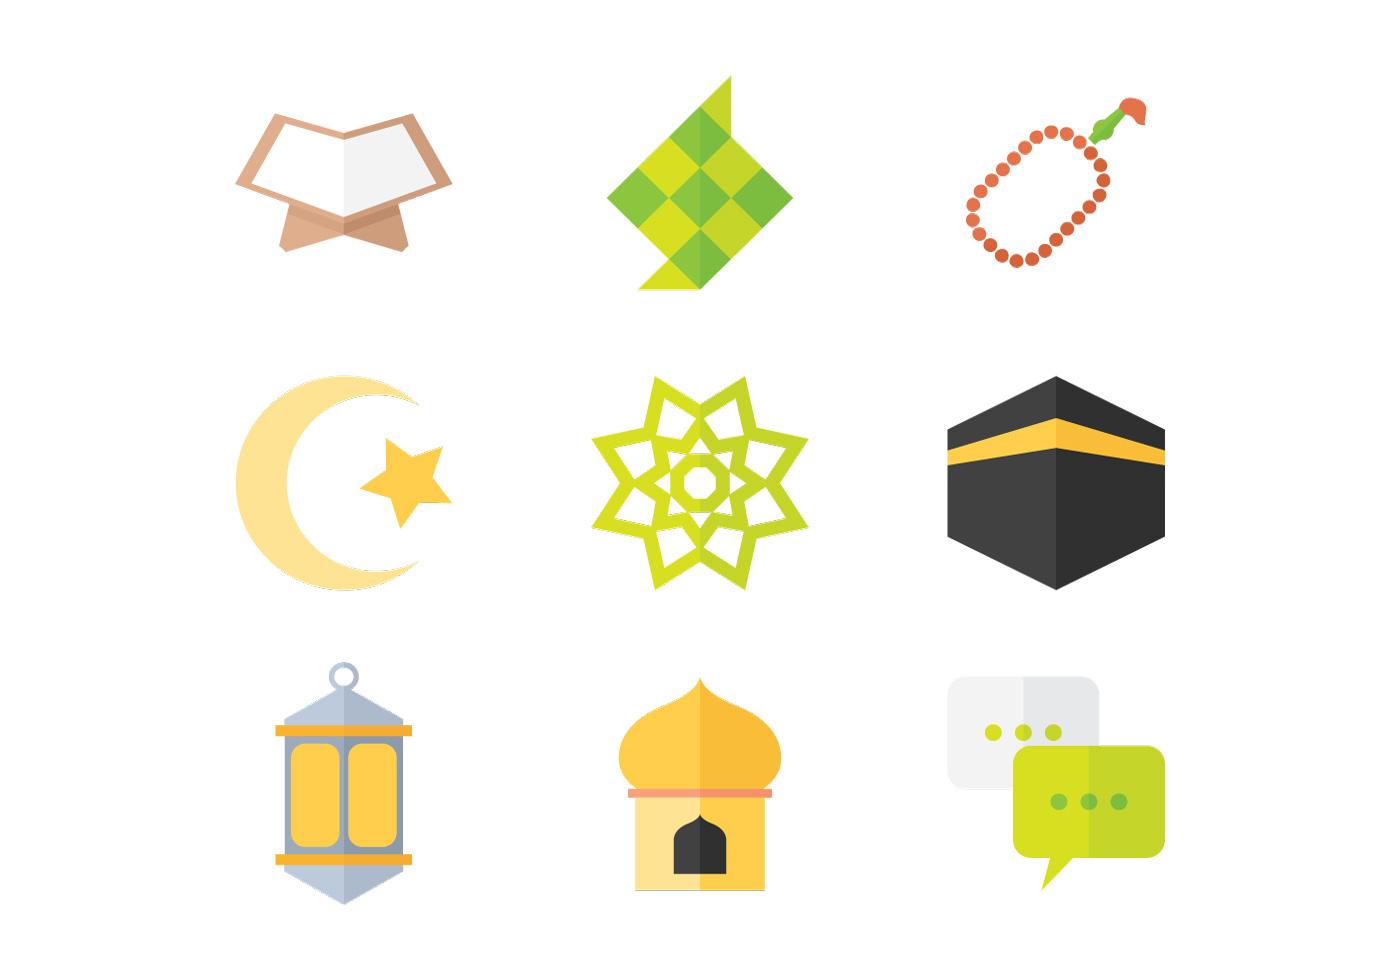 ketupat ramadan icon download free vectors clipart graphics vector art https www vecteezy com vector art 115263 ketupat ramadan icon